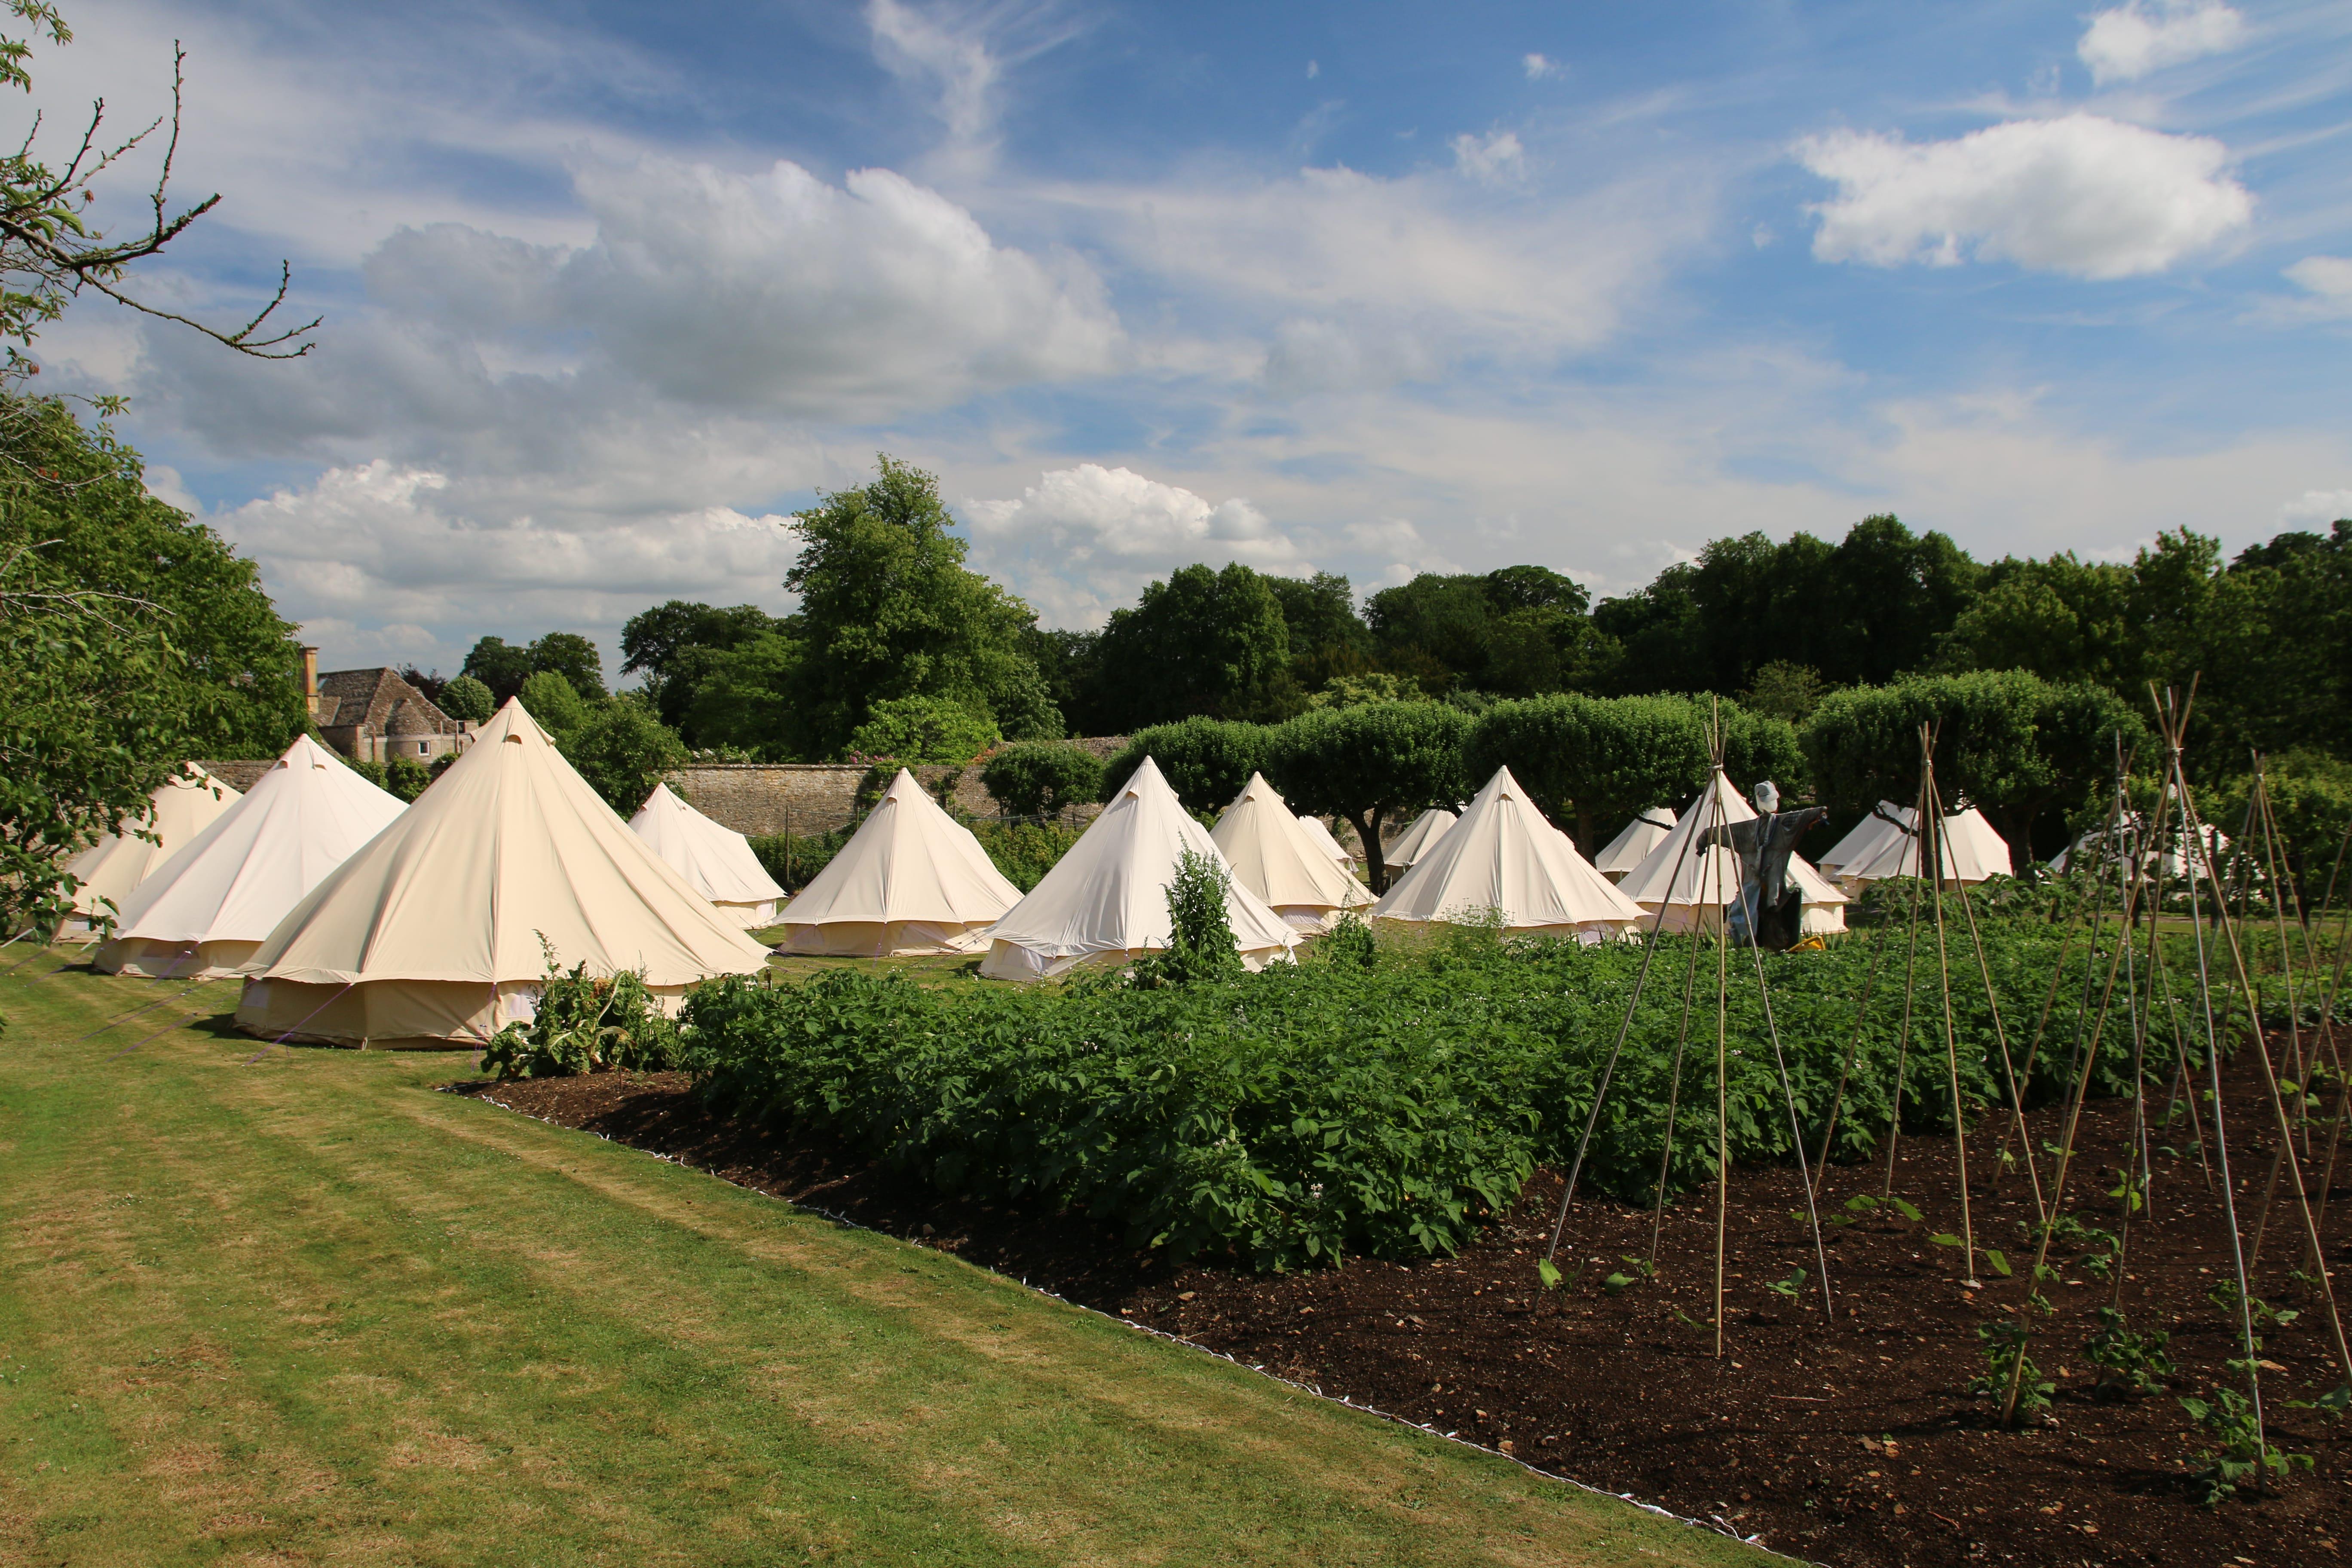 cornwell-manor-bell-tents